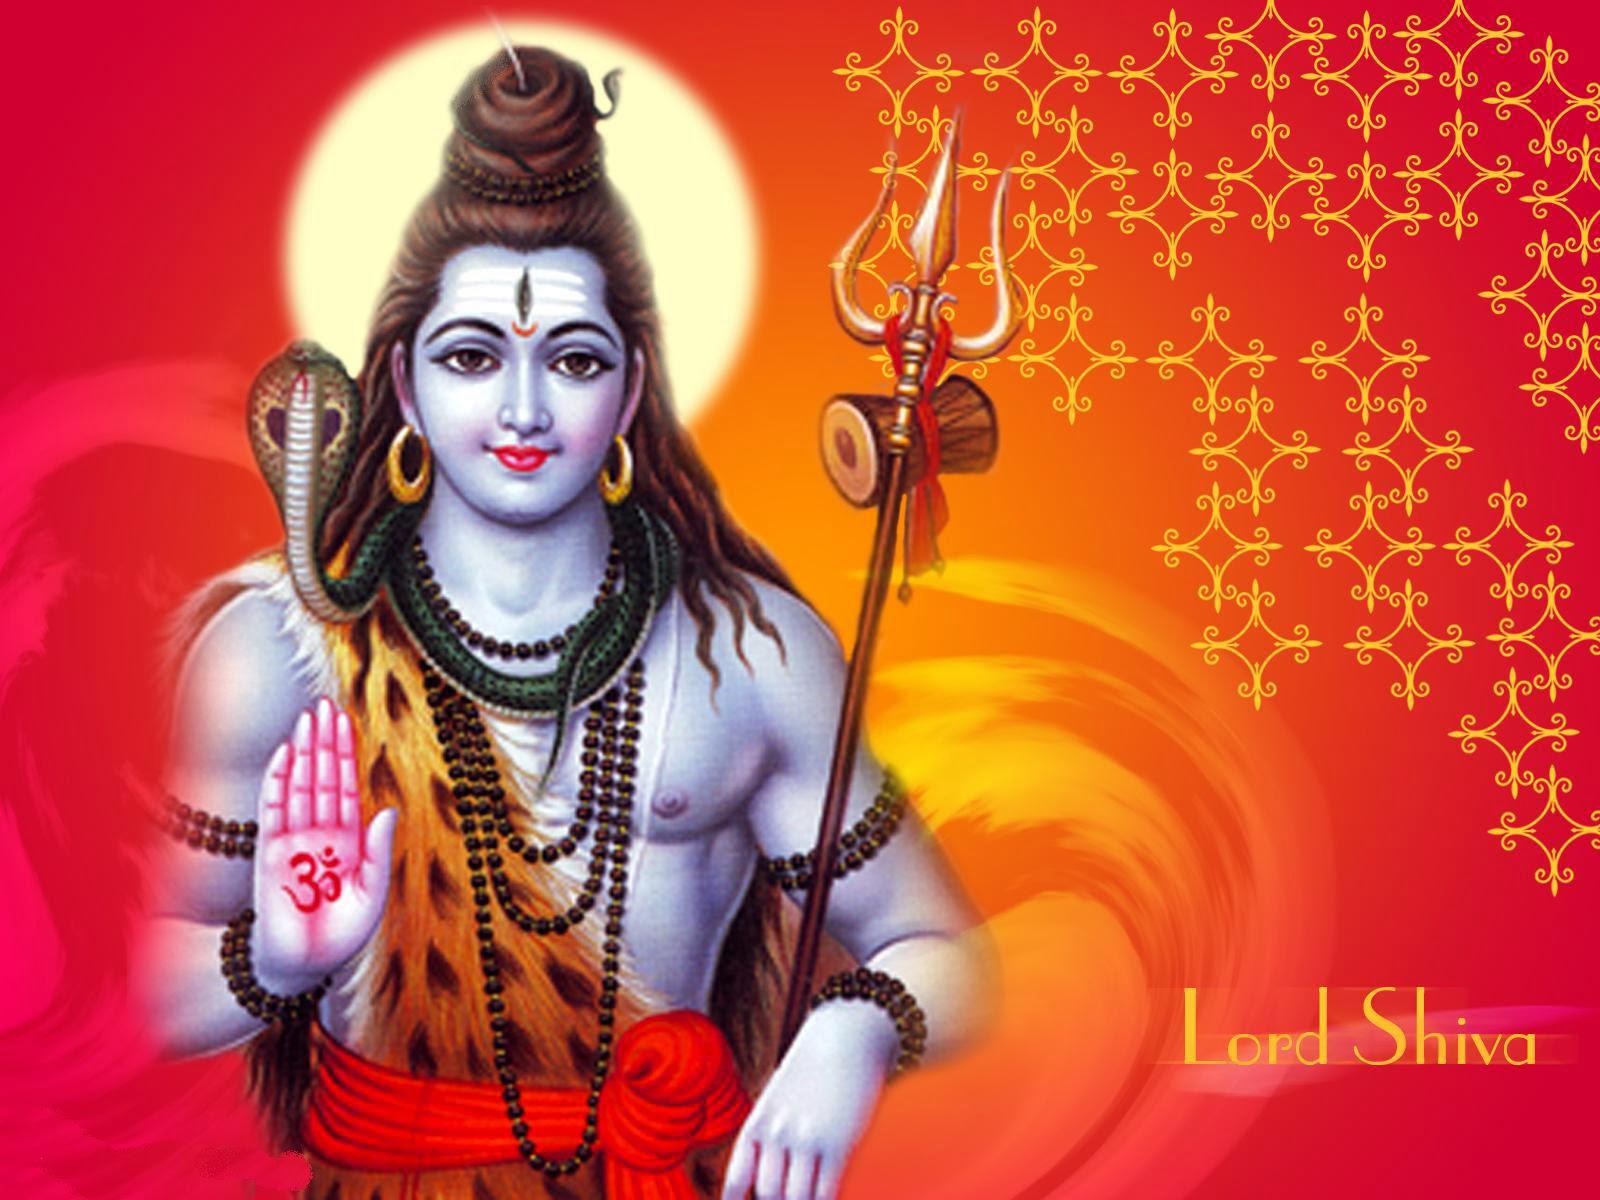 Quotes Photos Download Maha Shivaratri Wishes Greetings - Lord Shiva Wallpapers For Windows 7 - HD Wallpaper